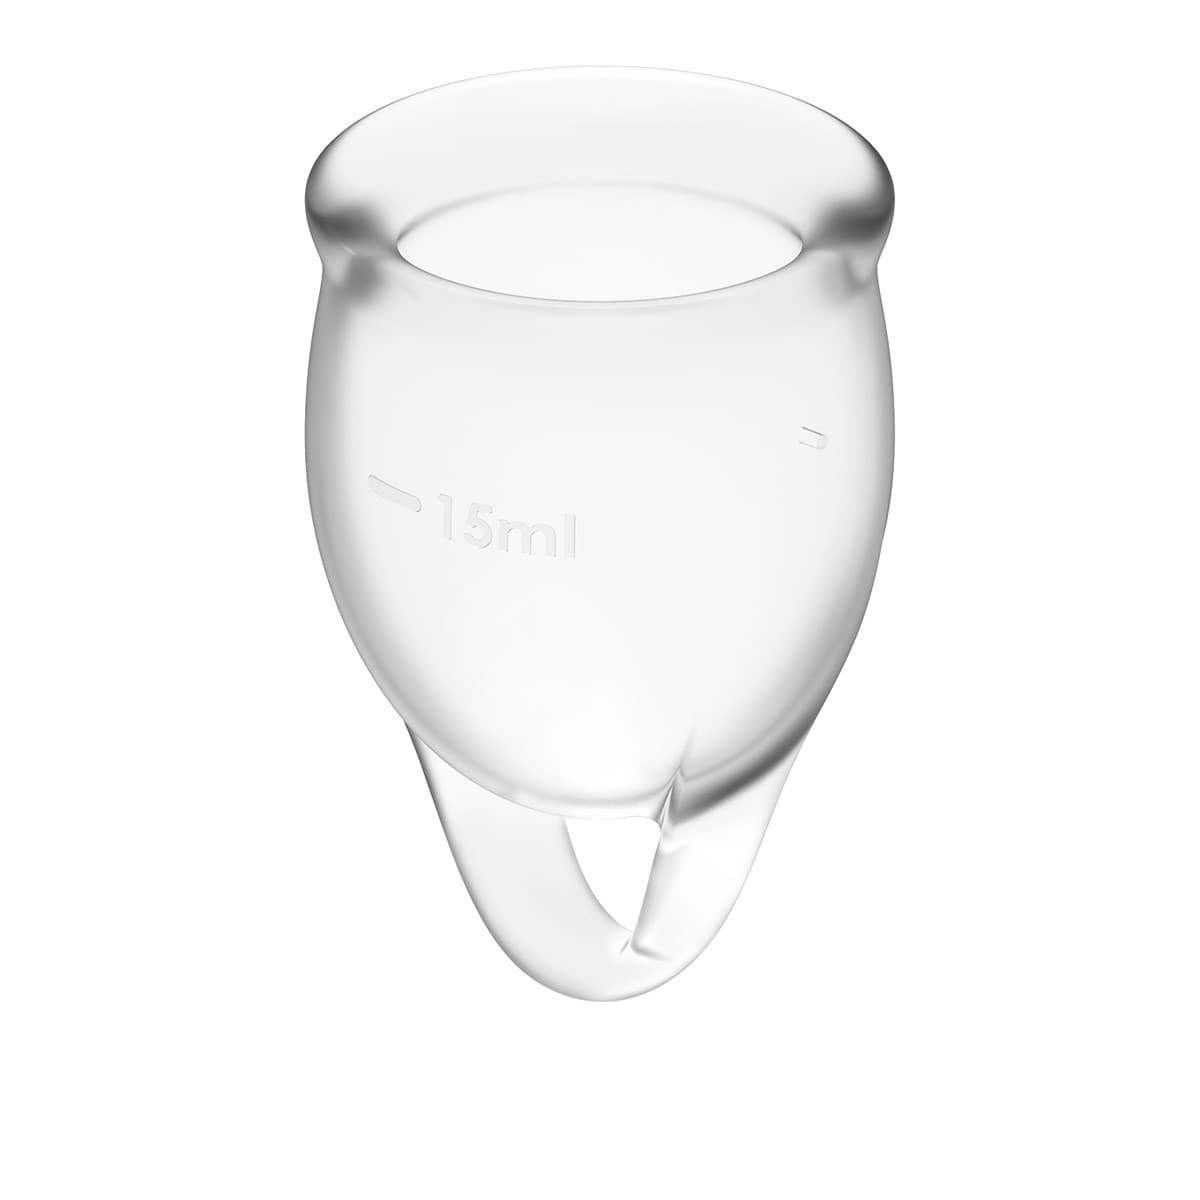 Satisfyer Feel Confident Menstrual Cup, Набор Менструальных Чаш - фото 18705